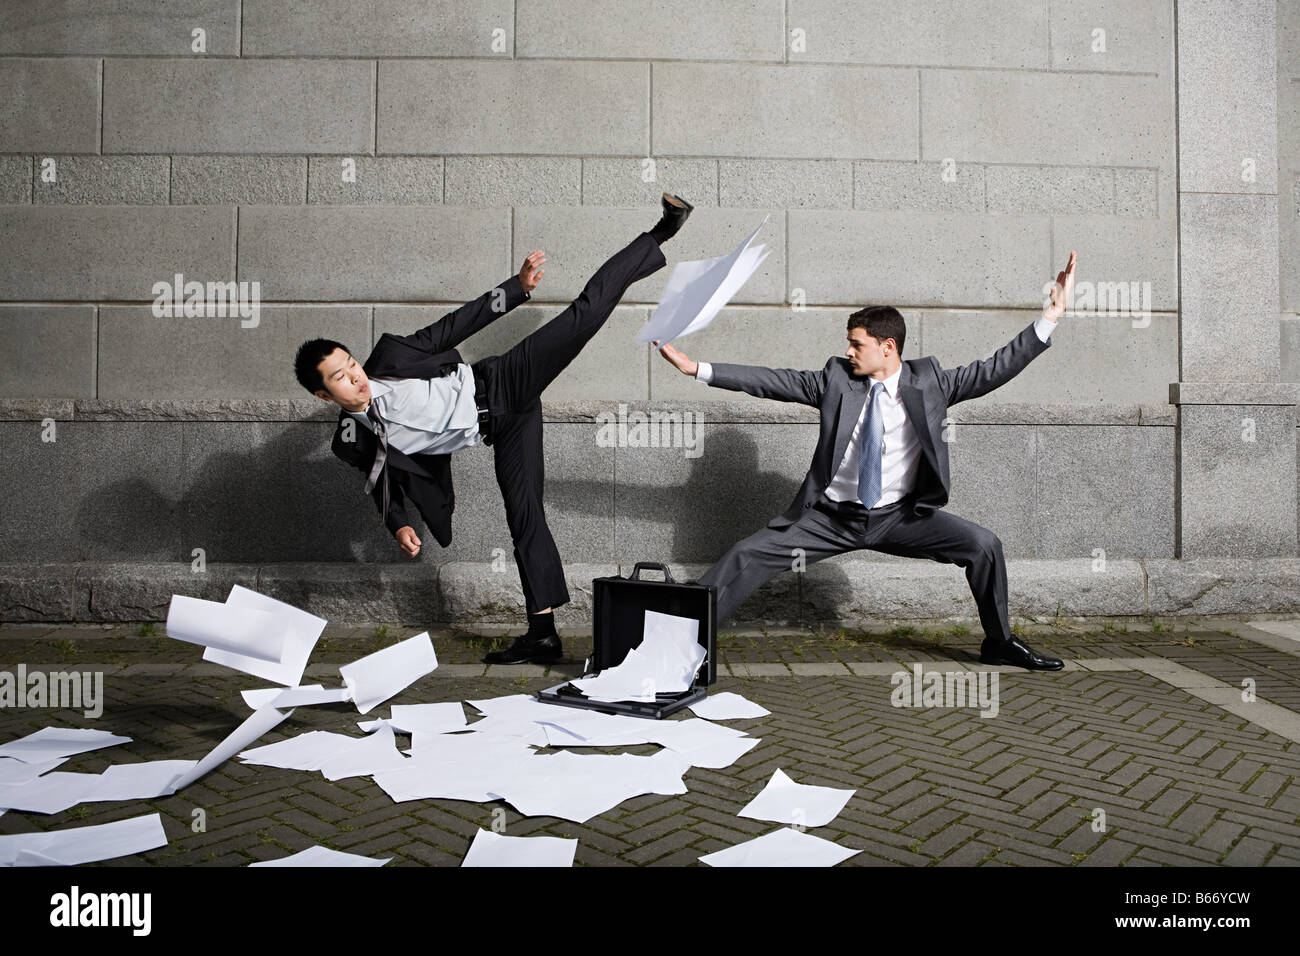 Businessmen fighting - Stock Image